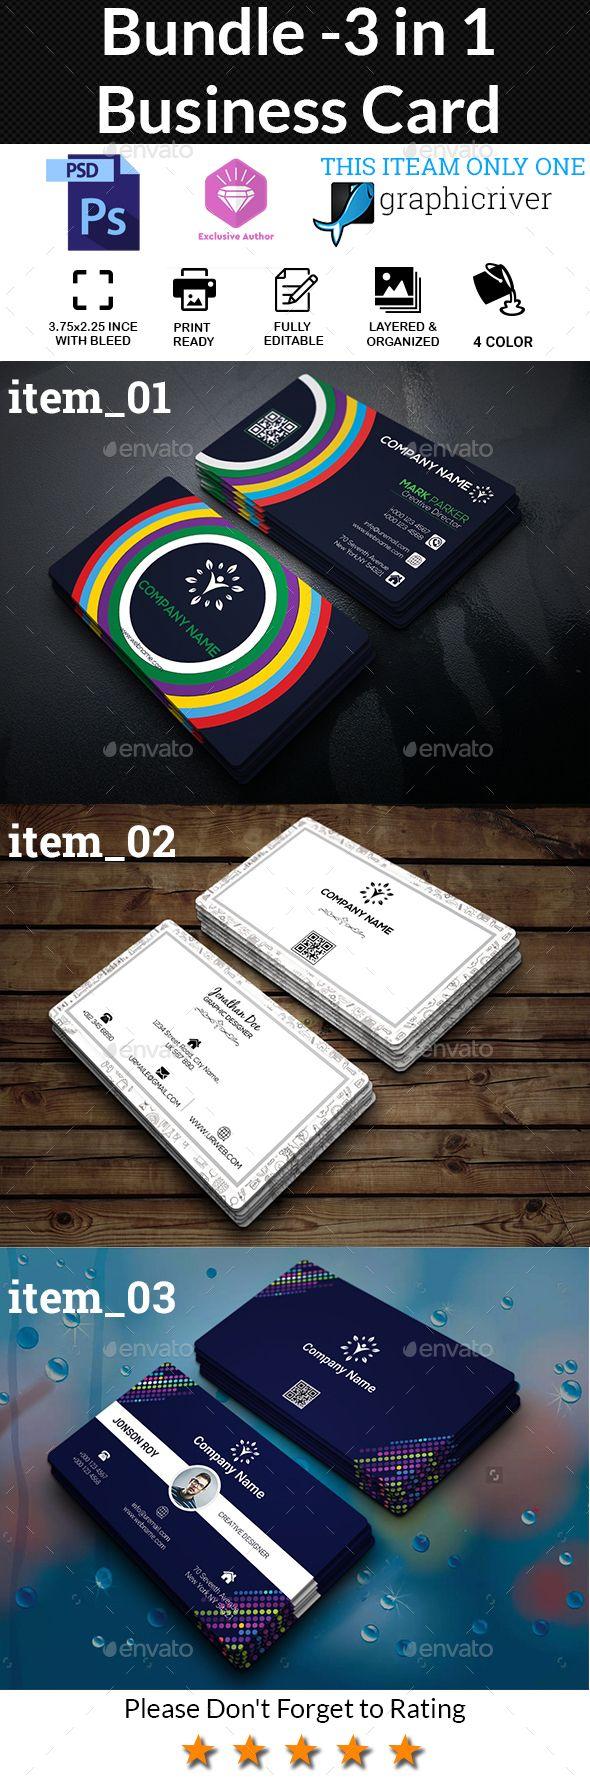 2090 best Brochur images on Pinterest | Lipsense business cards ...